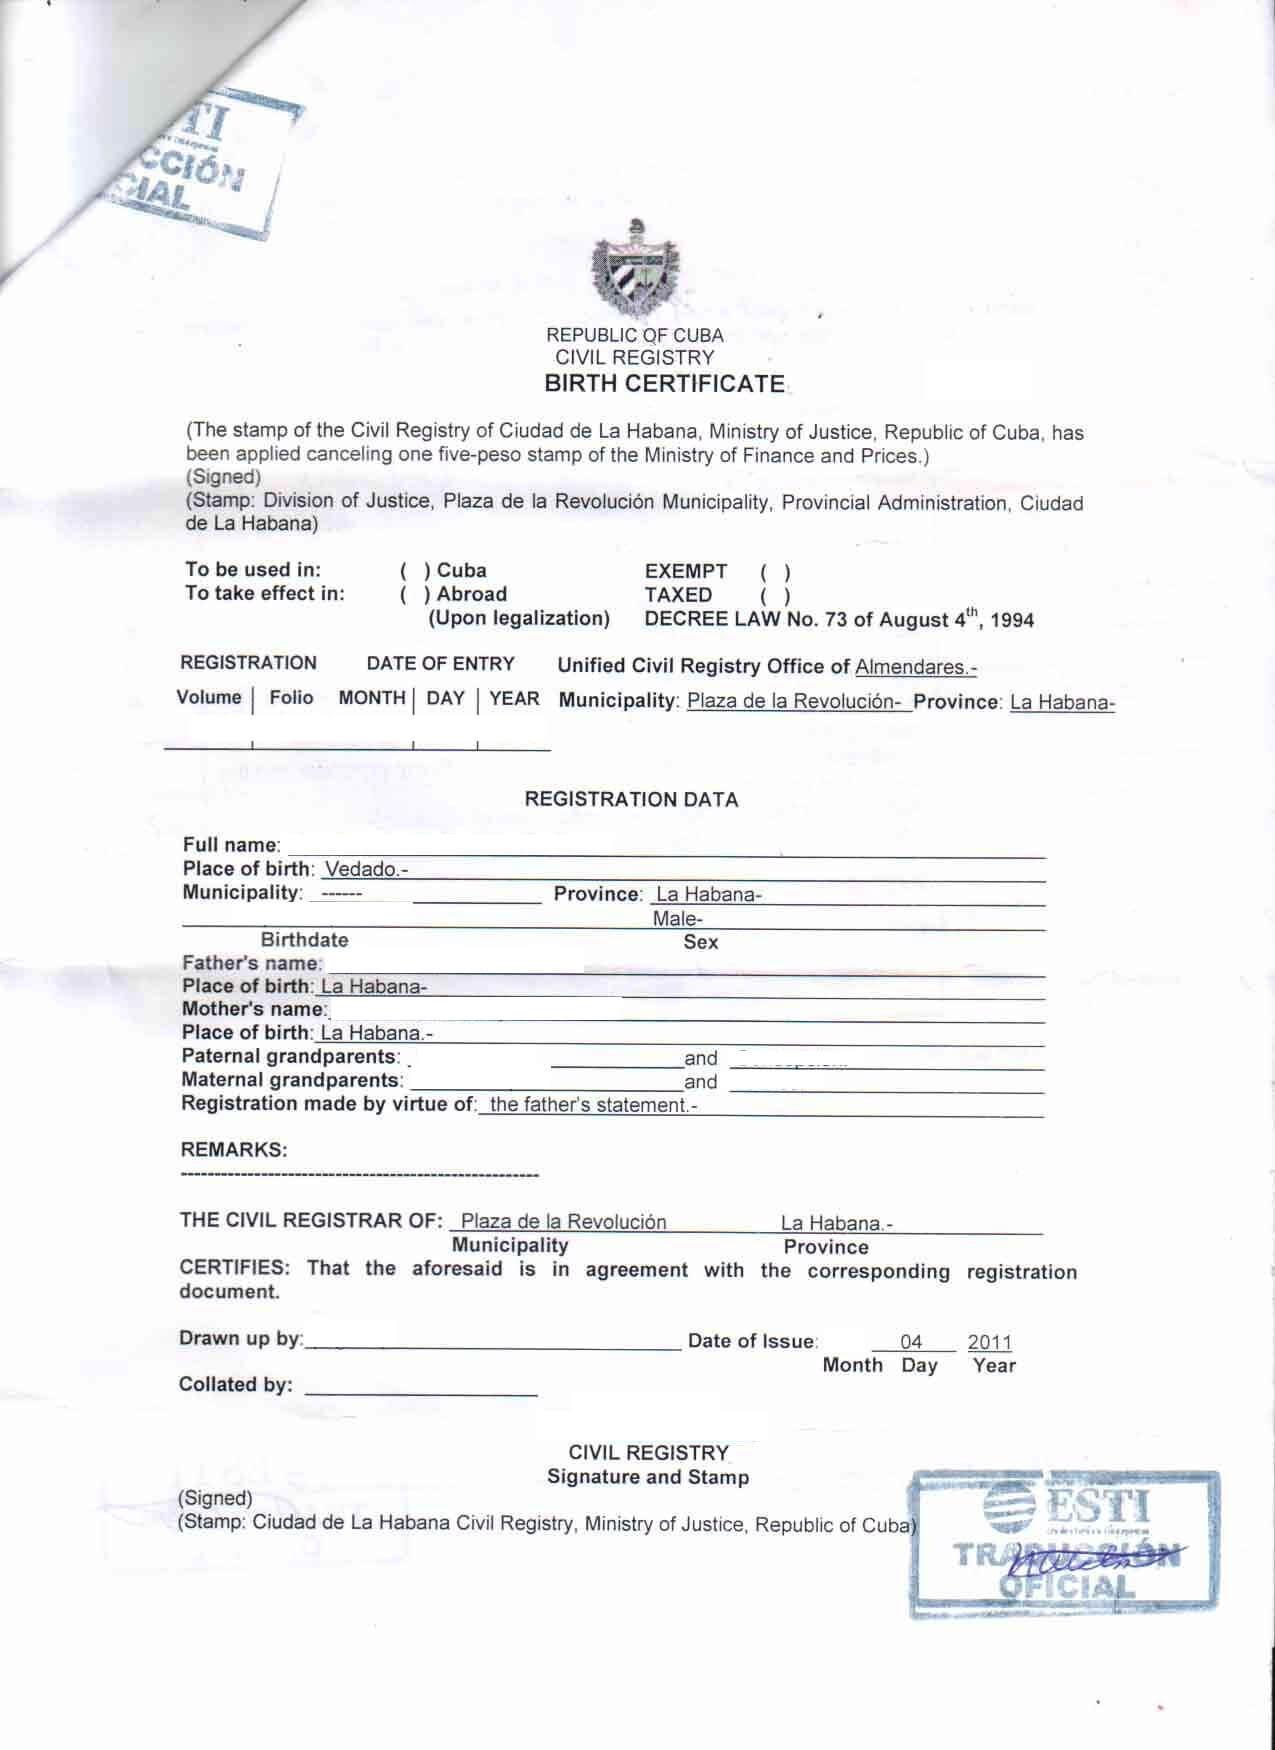 Birth Certificate Cuba English Translation Sample | Diigo Groups within Birth Certificate Translation Template English To Spanish